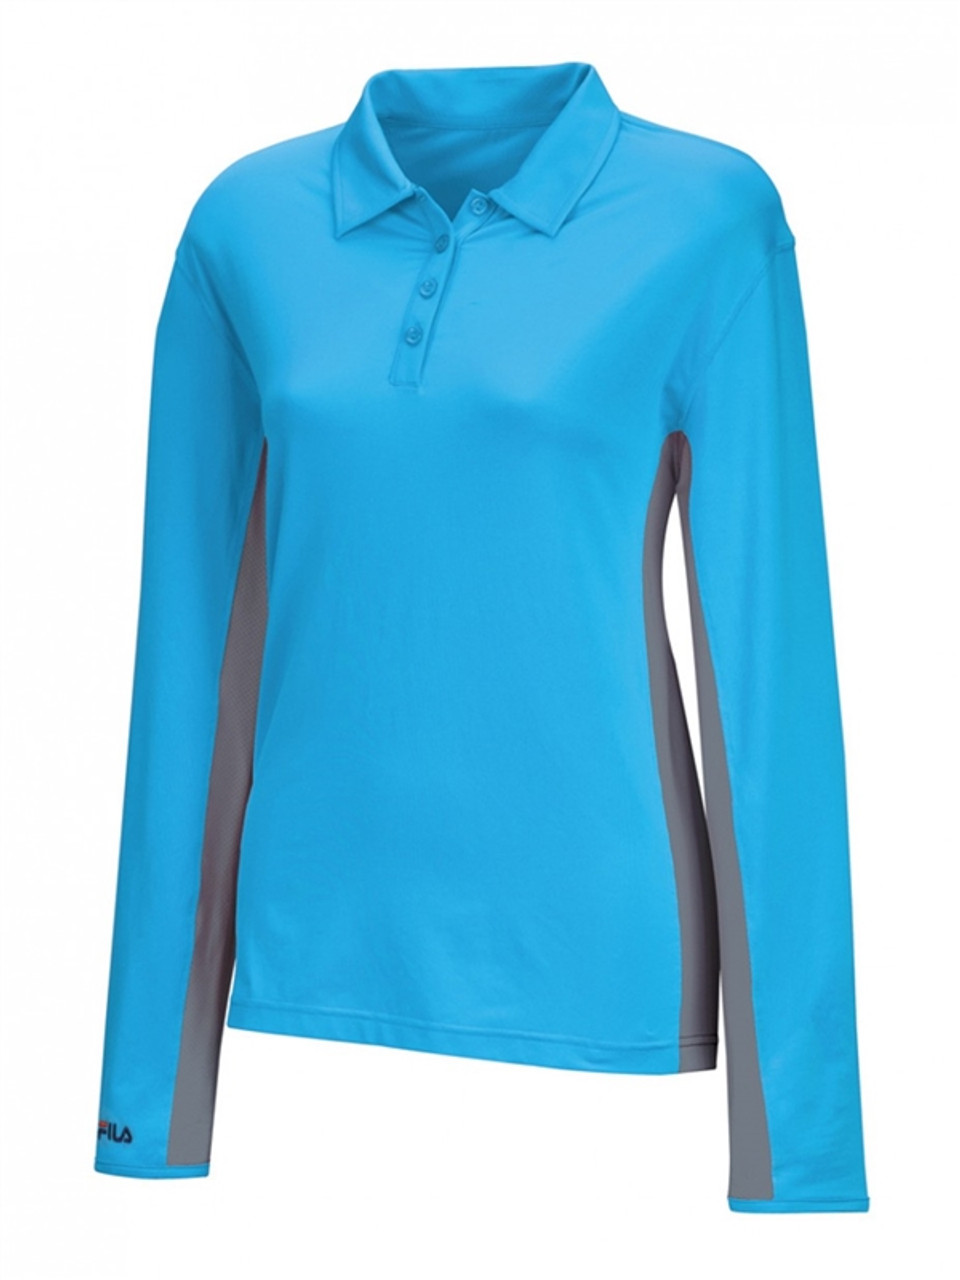 6b35f27160a FILA Golf Newport Long Sleeve Polo 3 Colors